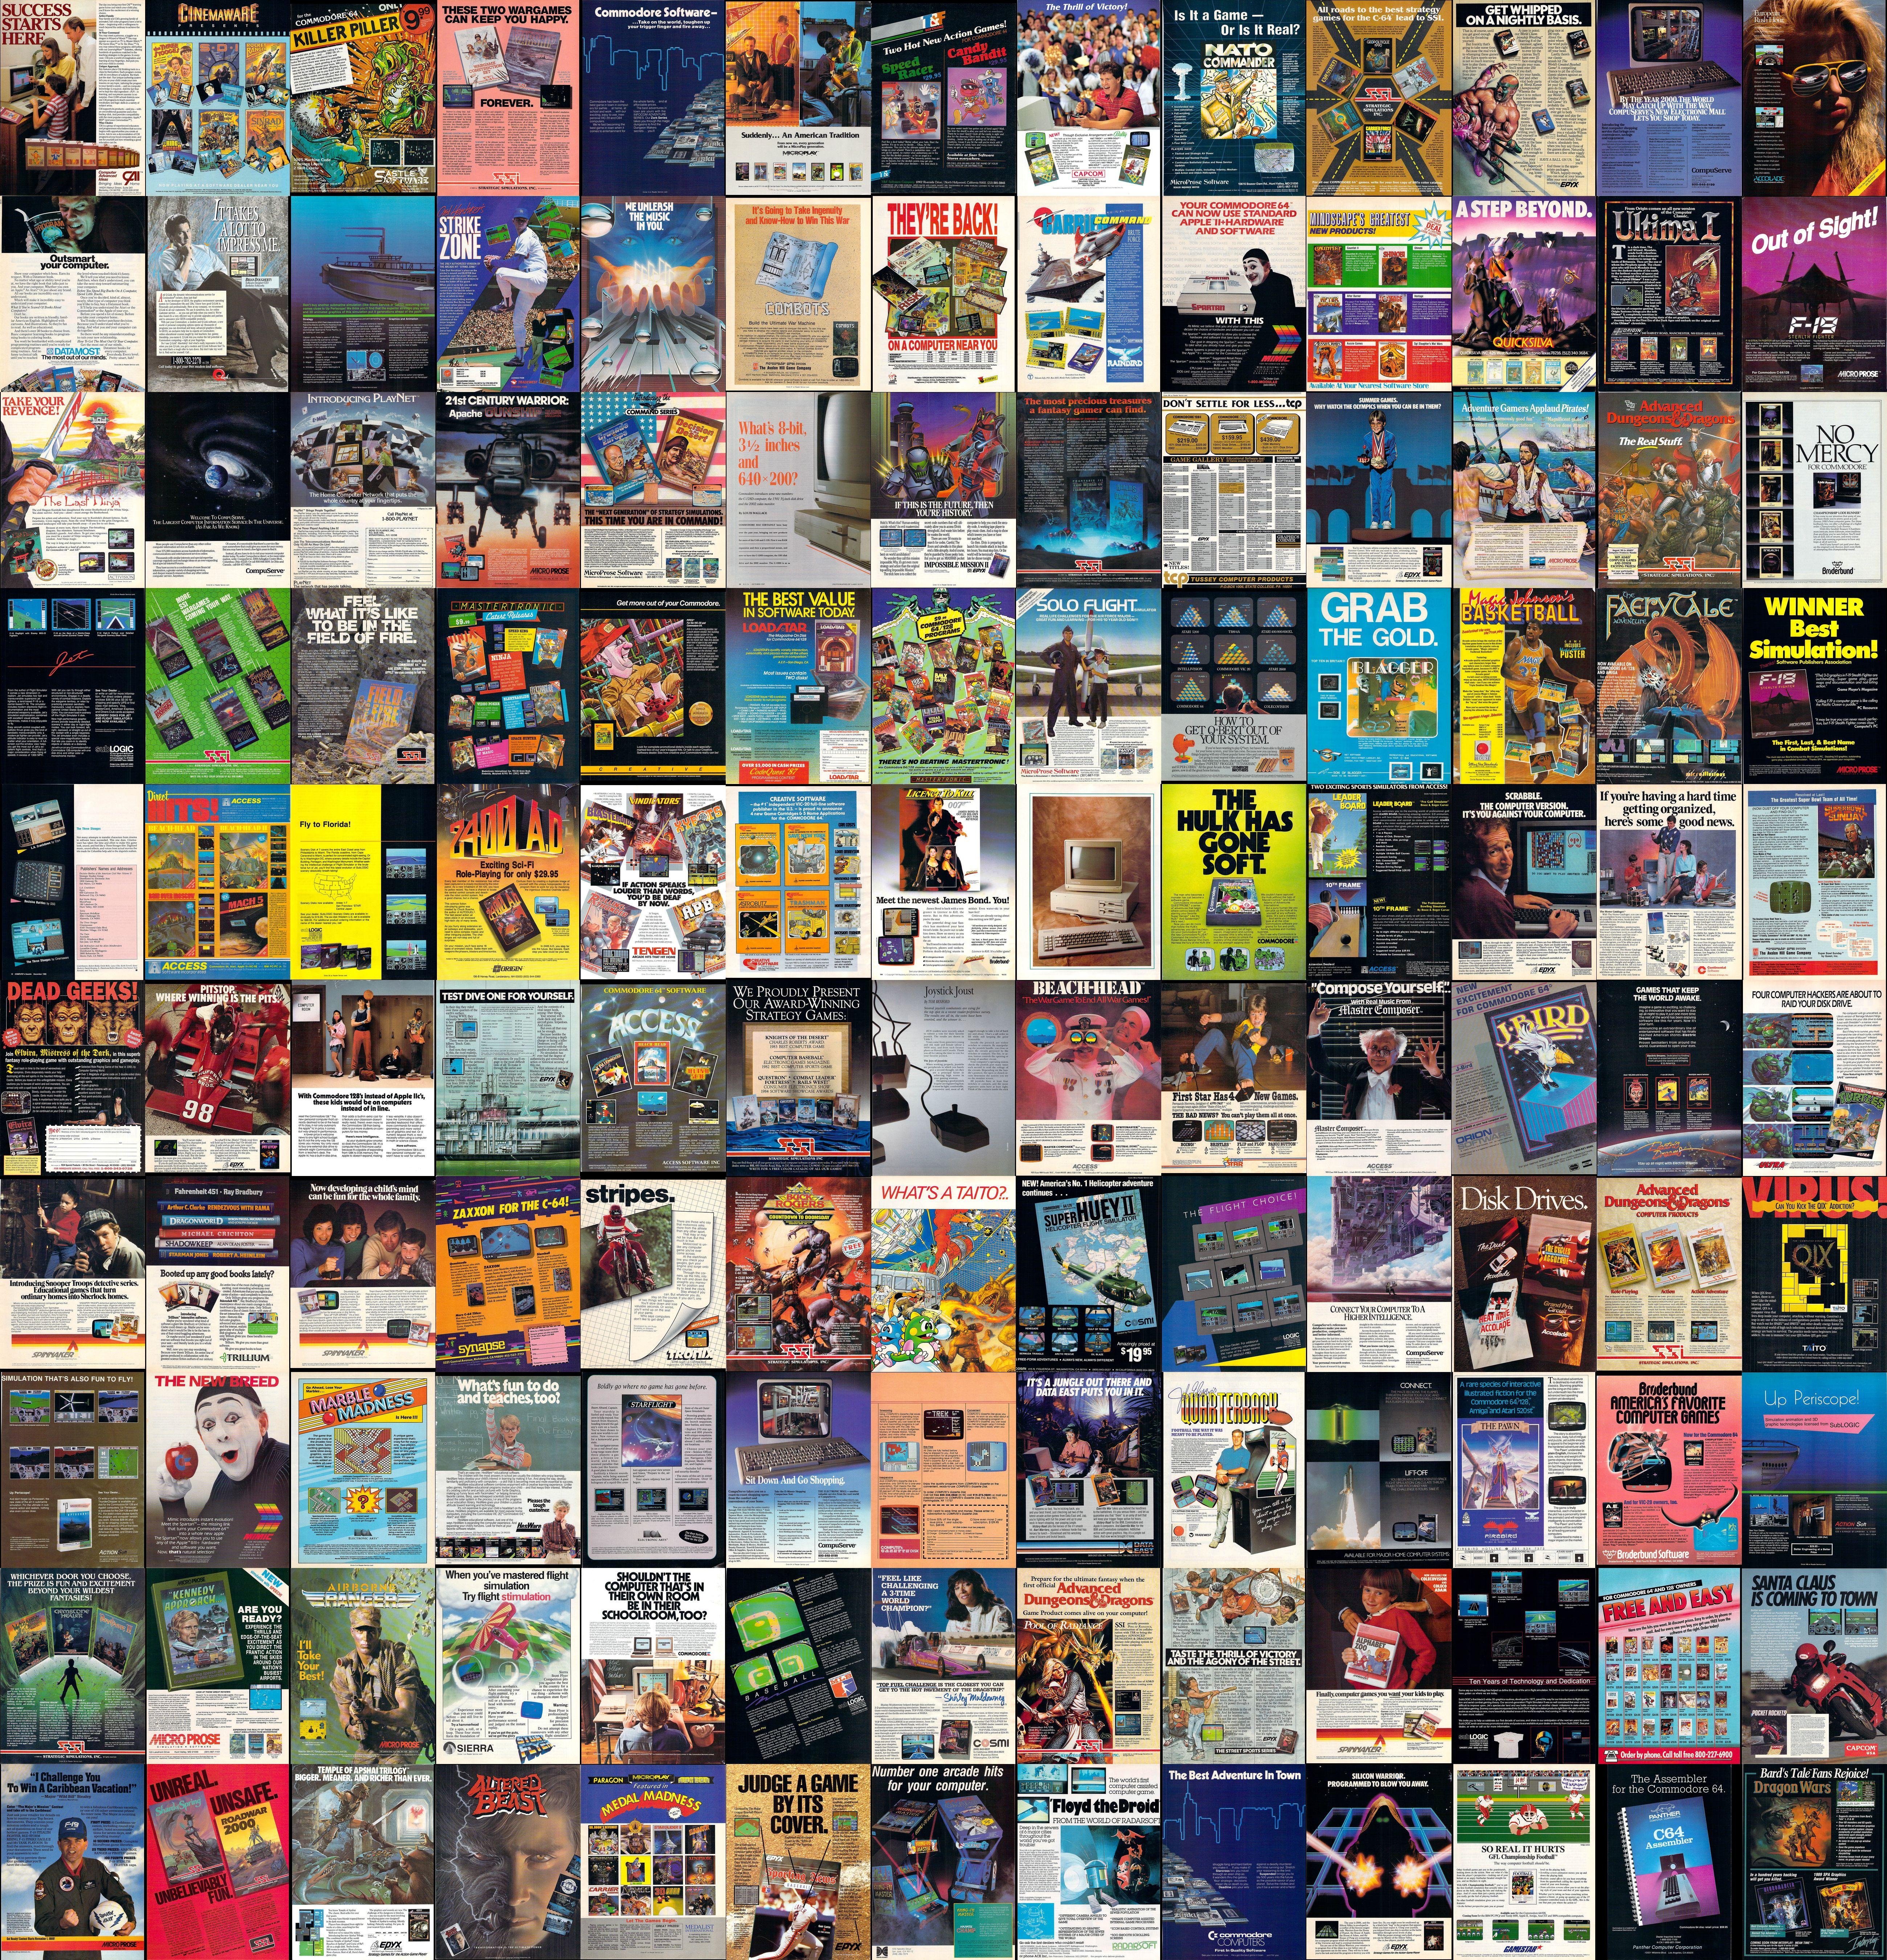 commodore 64 game ads wallpaper image Wallpaper